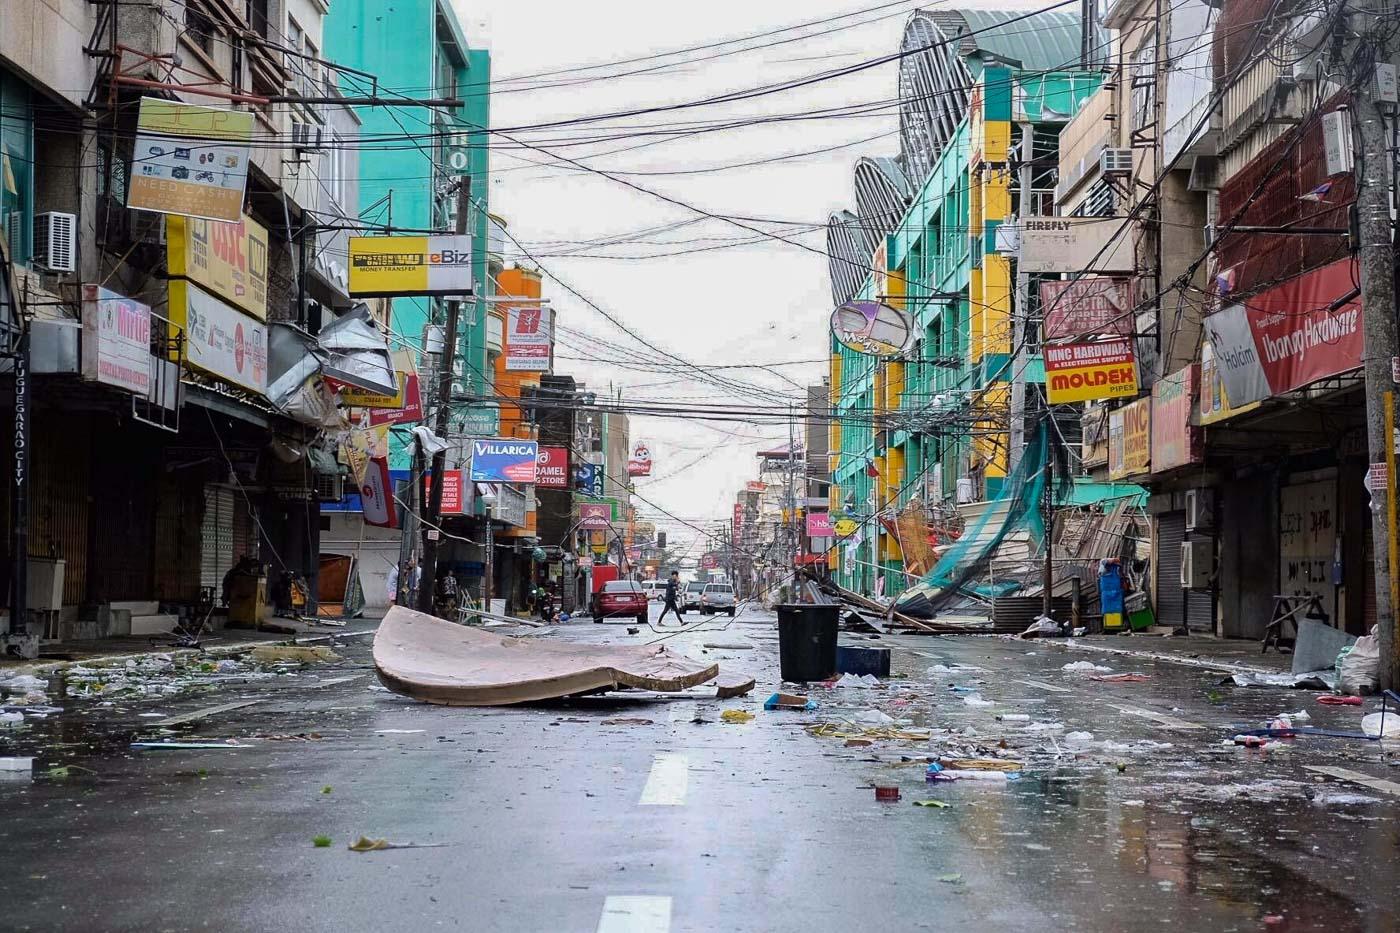 DEVASTATION. Establishments in Tuguegarao City, Cagayan, after Typhoon Ompong  made landfall. Photo by Lester Joseph Mora Ballad